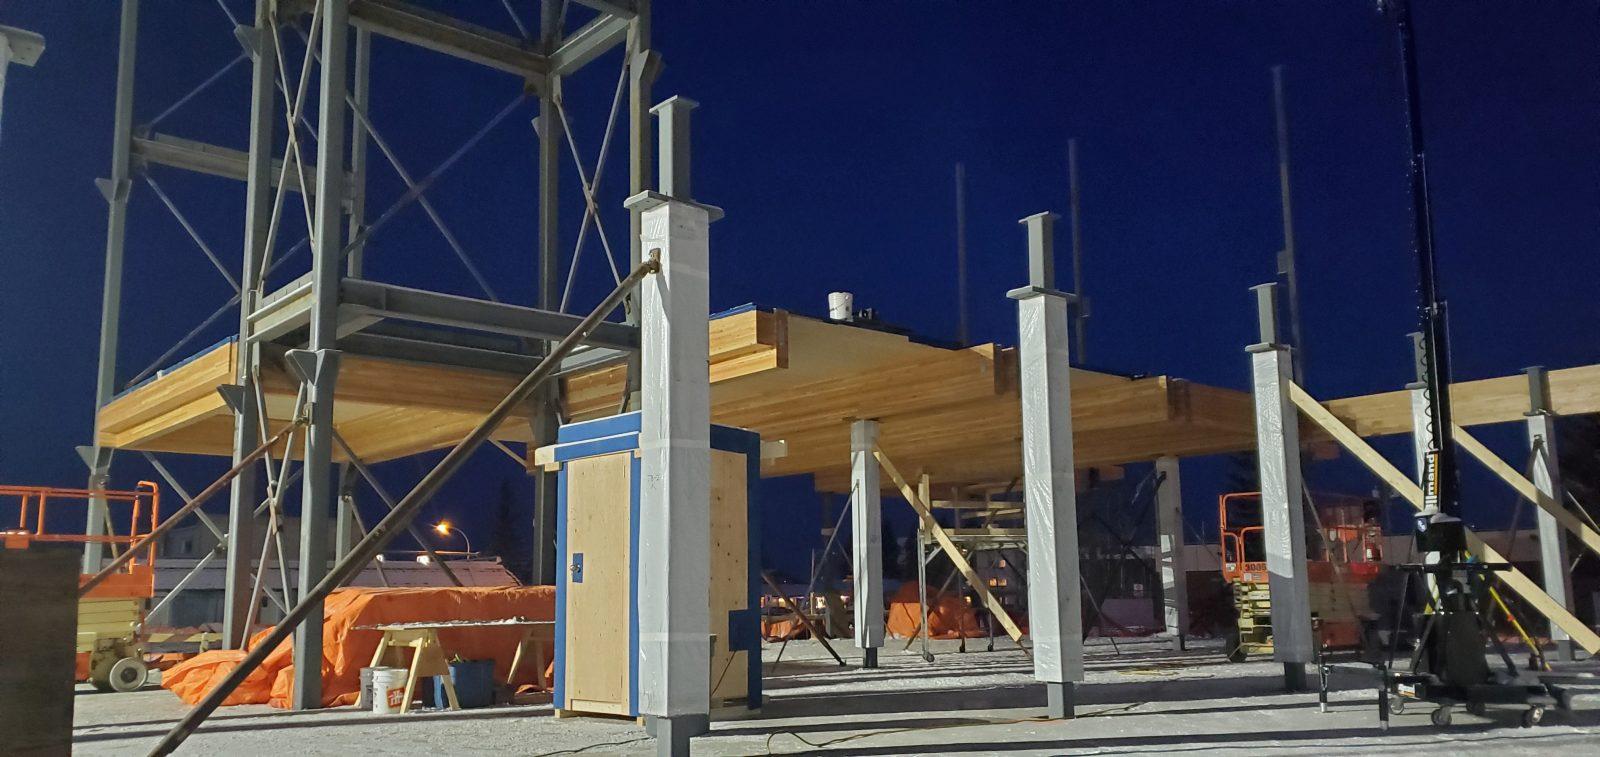 Fort St. John Civic Building construction